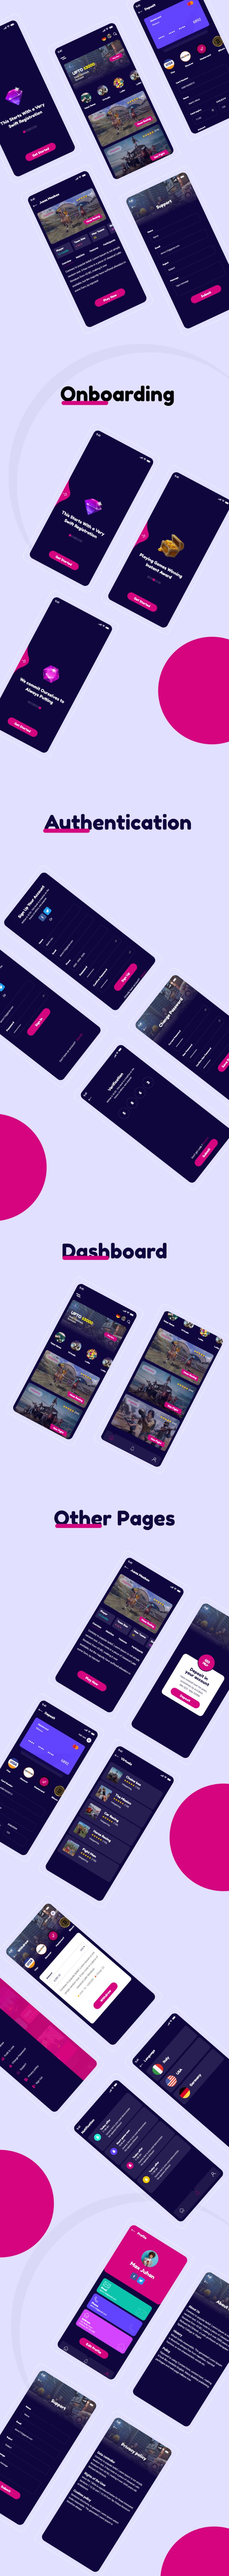 Gamebaz - Online Gaming App UI Kit - 1